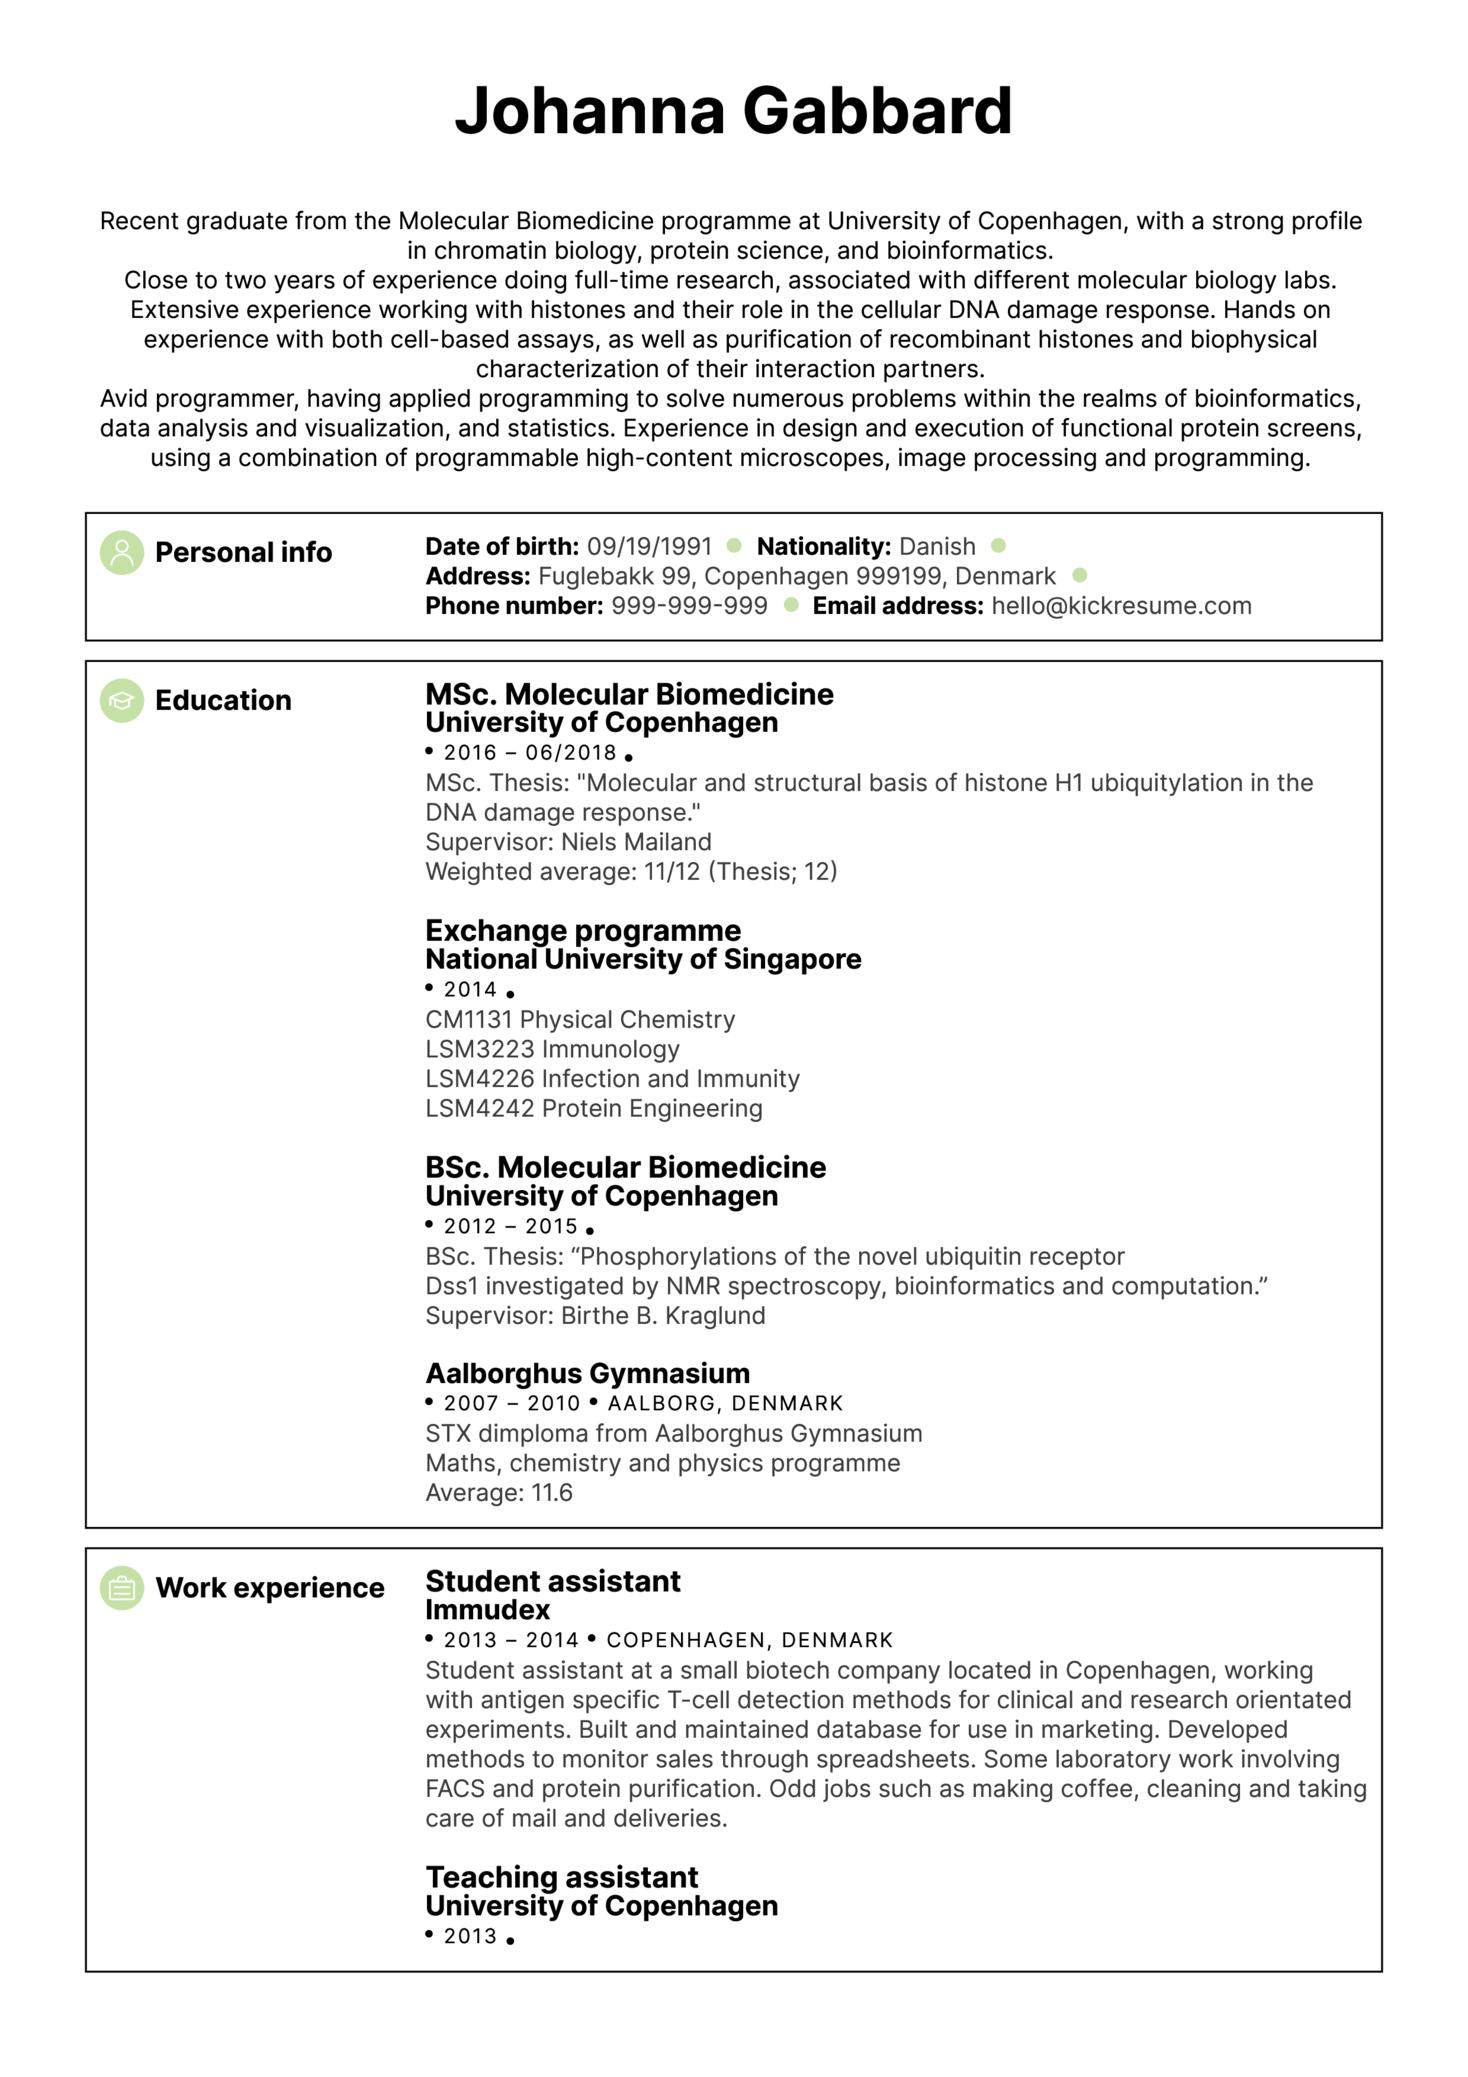 University Biomedical Researcher Resume Sample (Part 1)